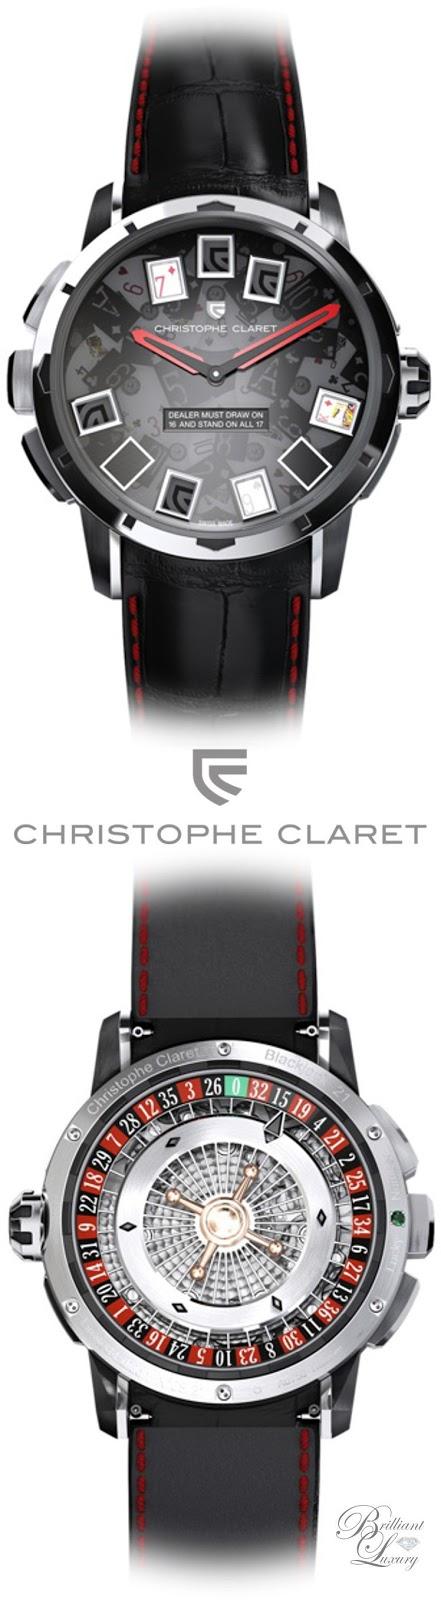 Brilliant Luxury ♦ Christophe Claret Blackjack Watch Men